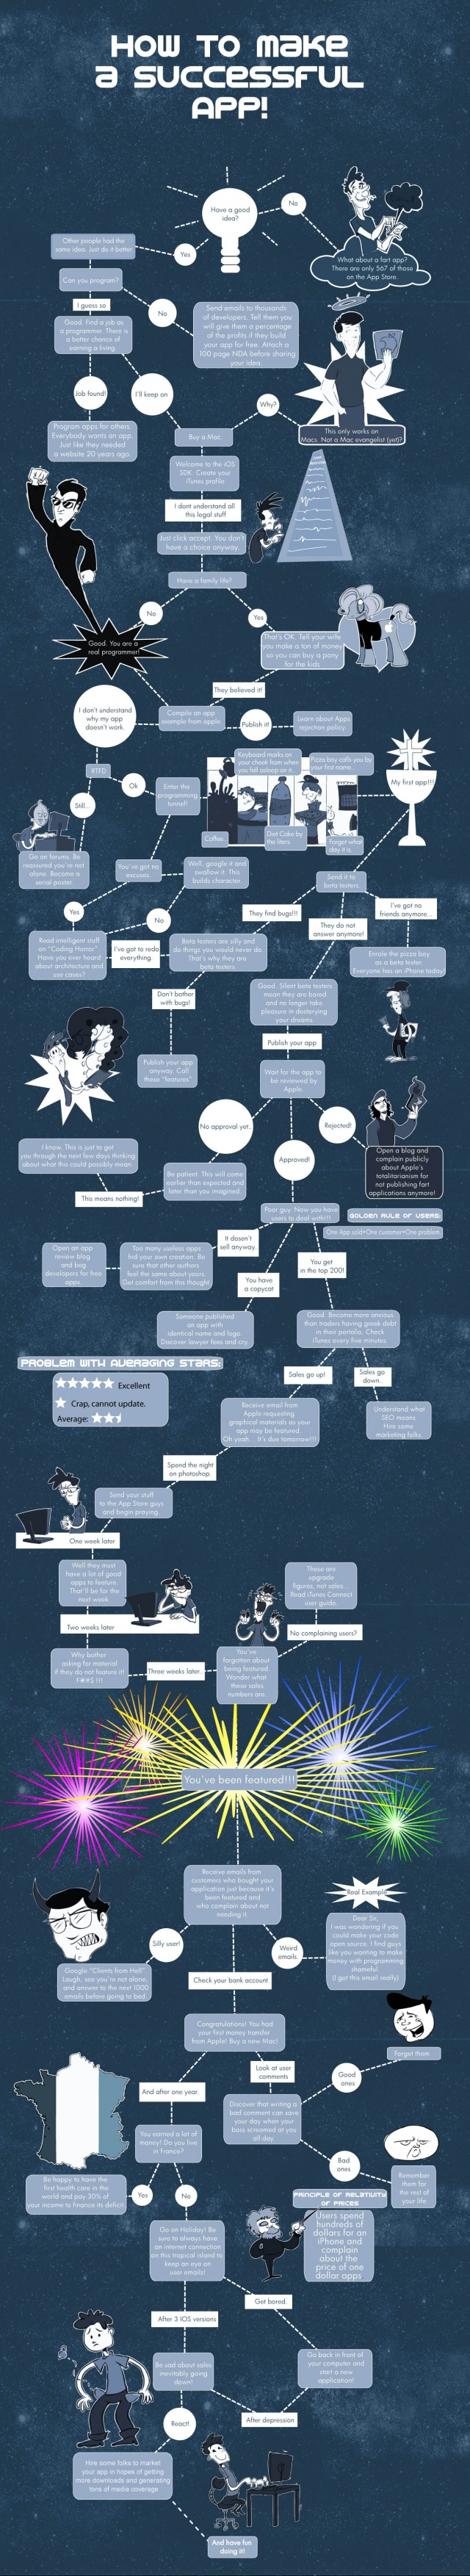 Humor Infographic